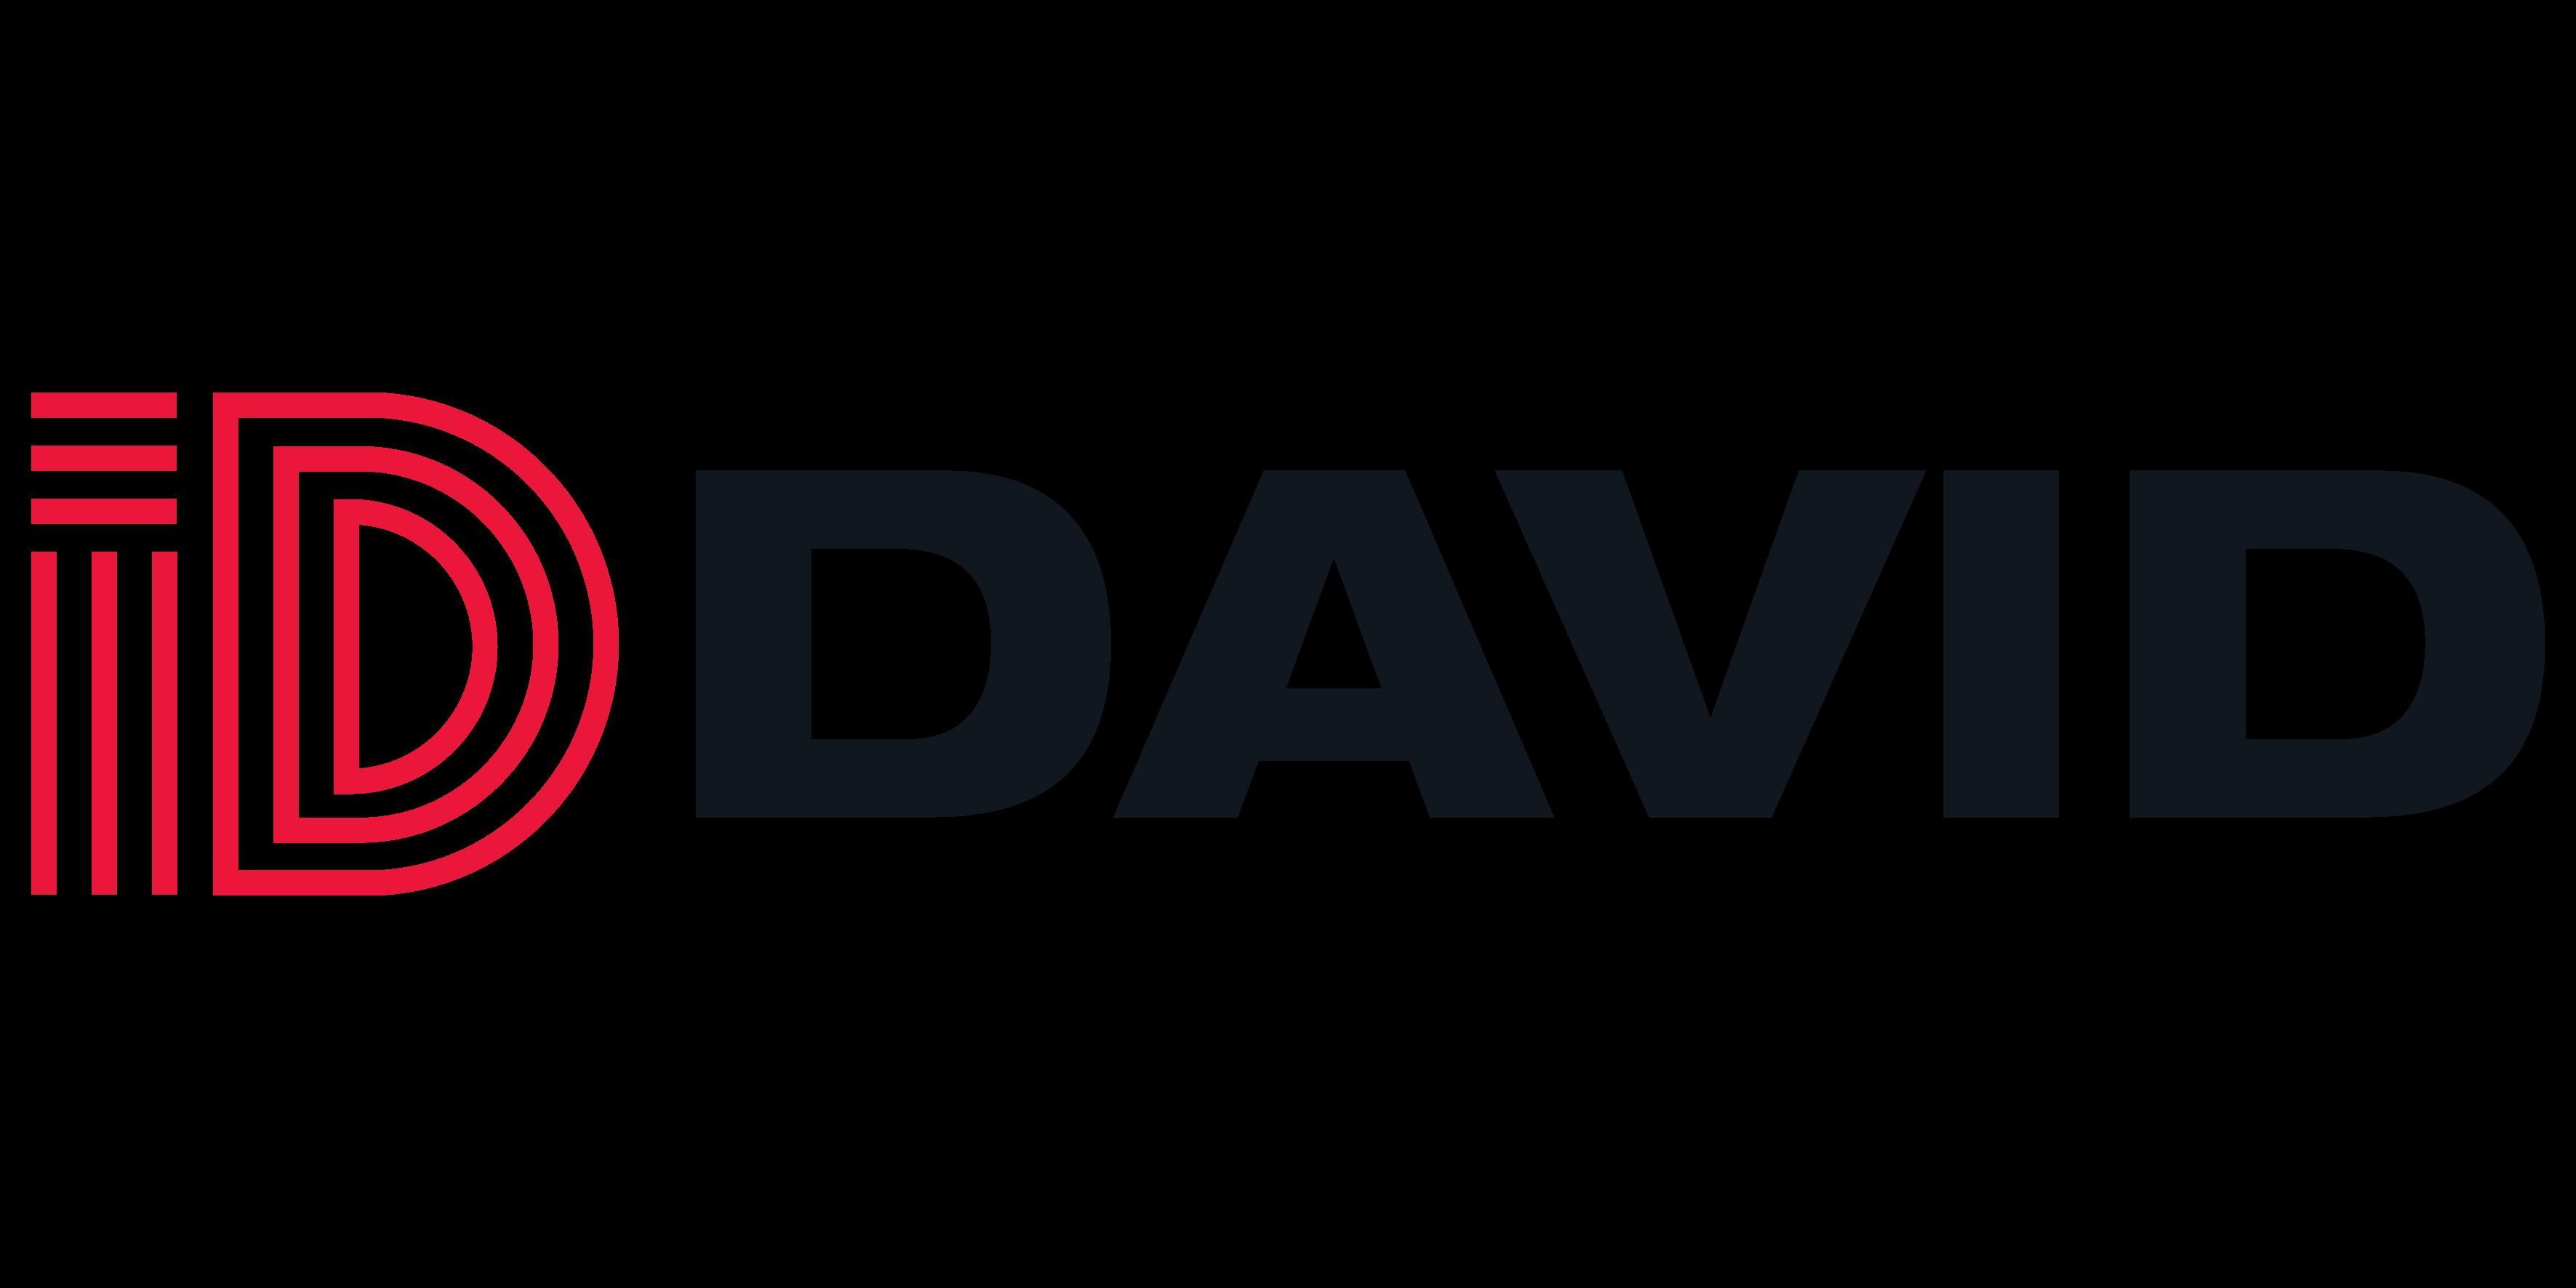 INDUSTRIAS DAVID S.L.U.